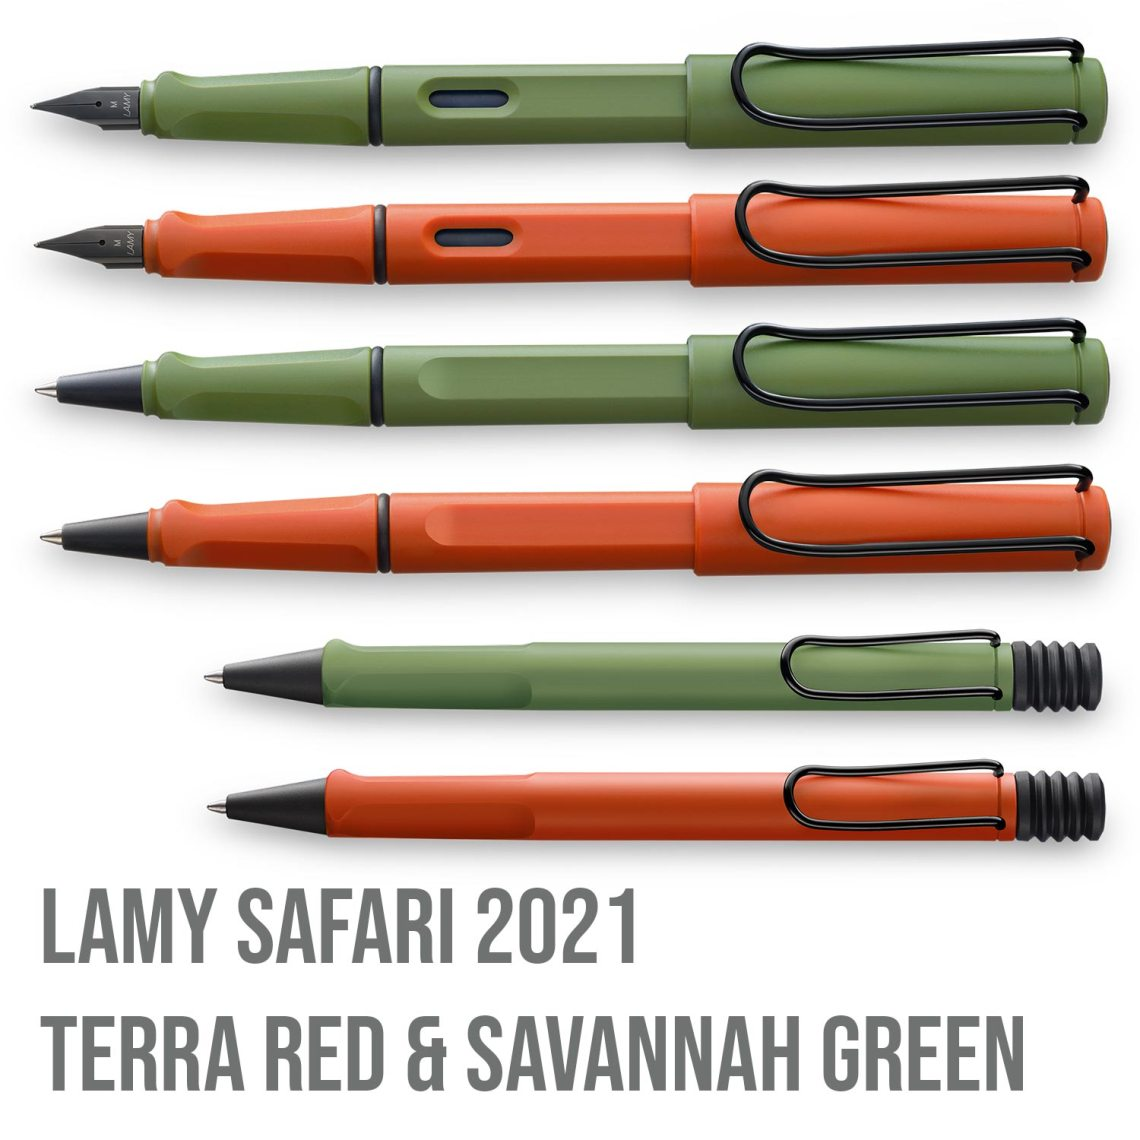 Savannah Green and Terra Red